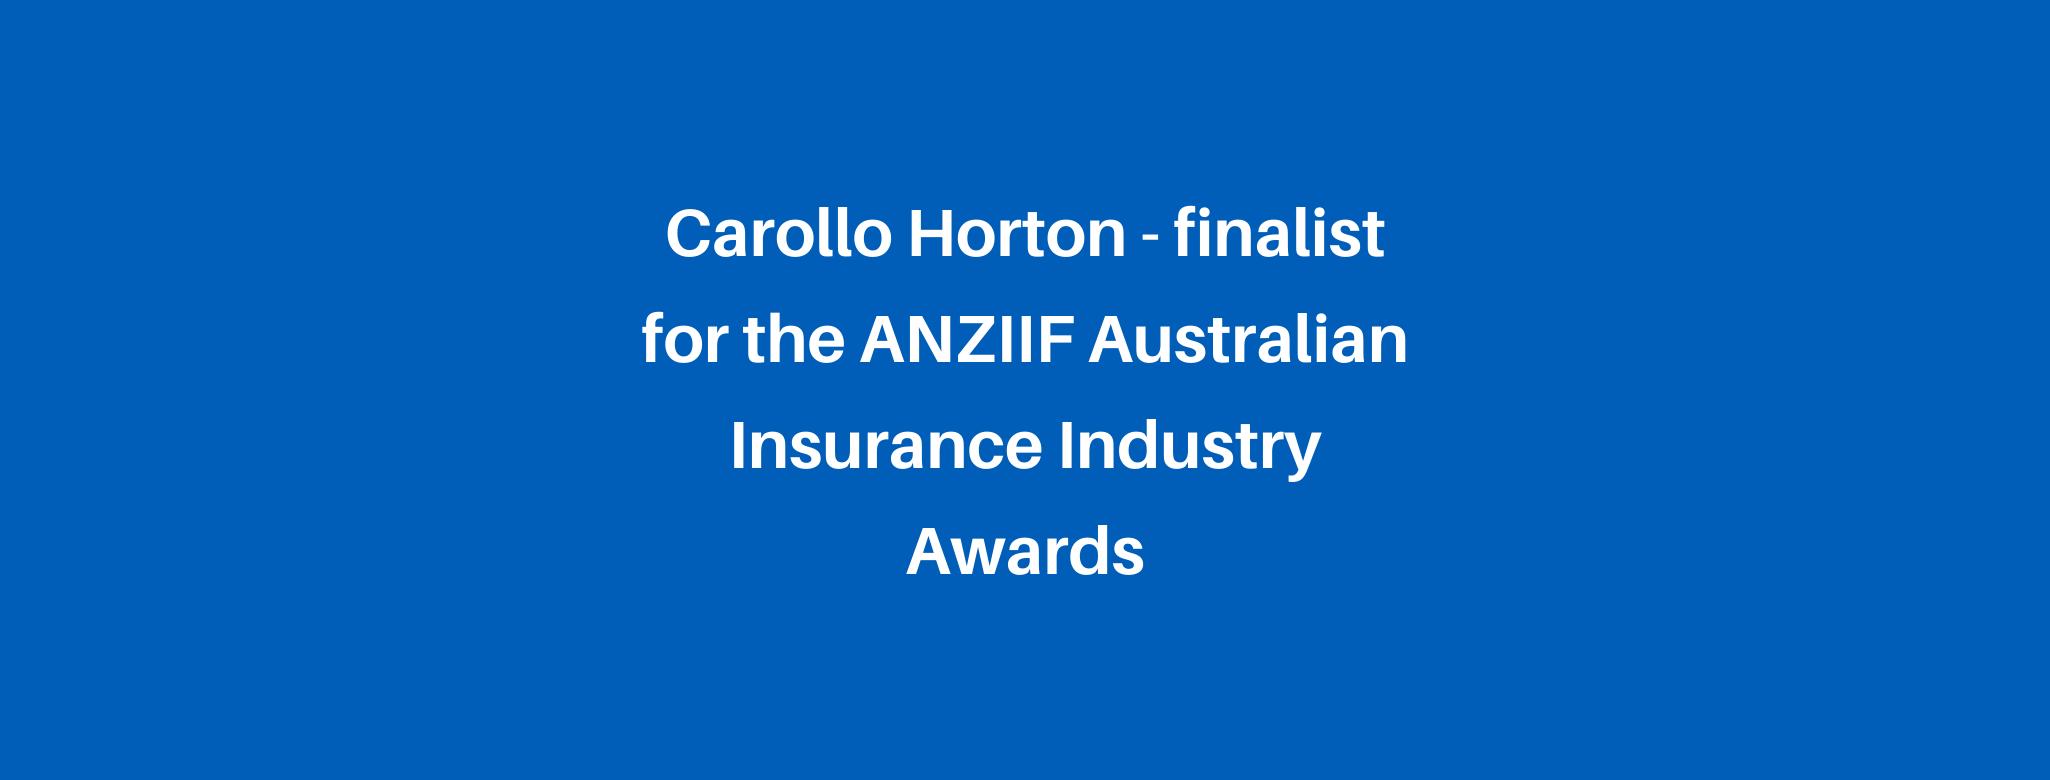 Finalist for the ANZIIF Australian Insurance Industry Awards